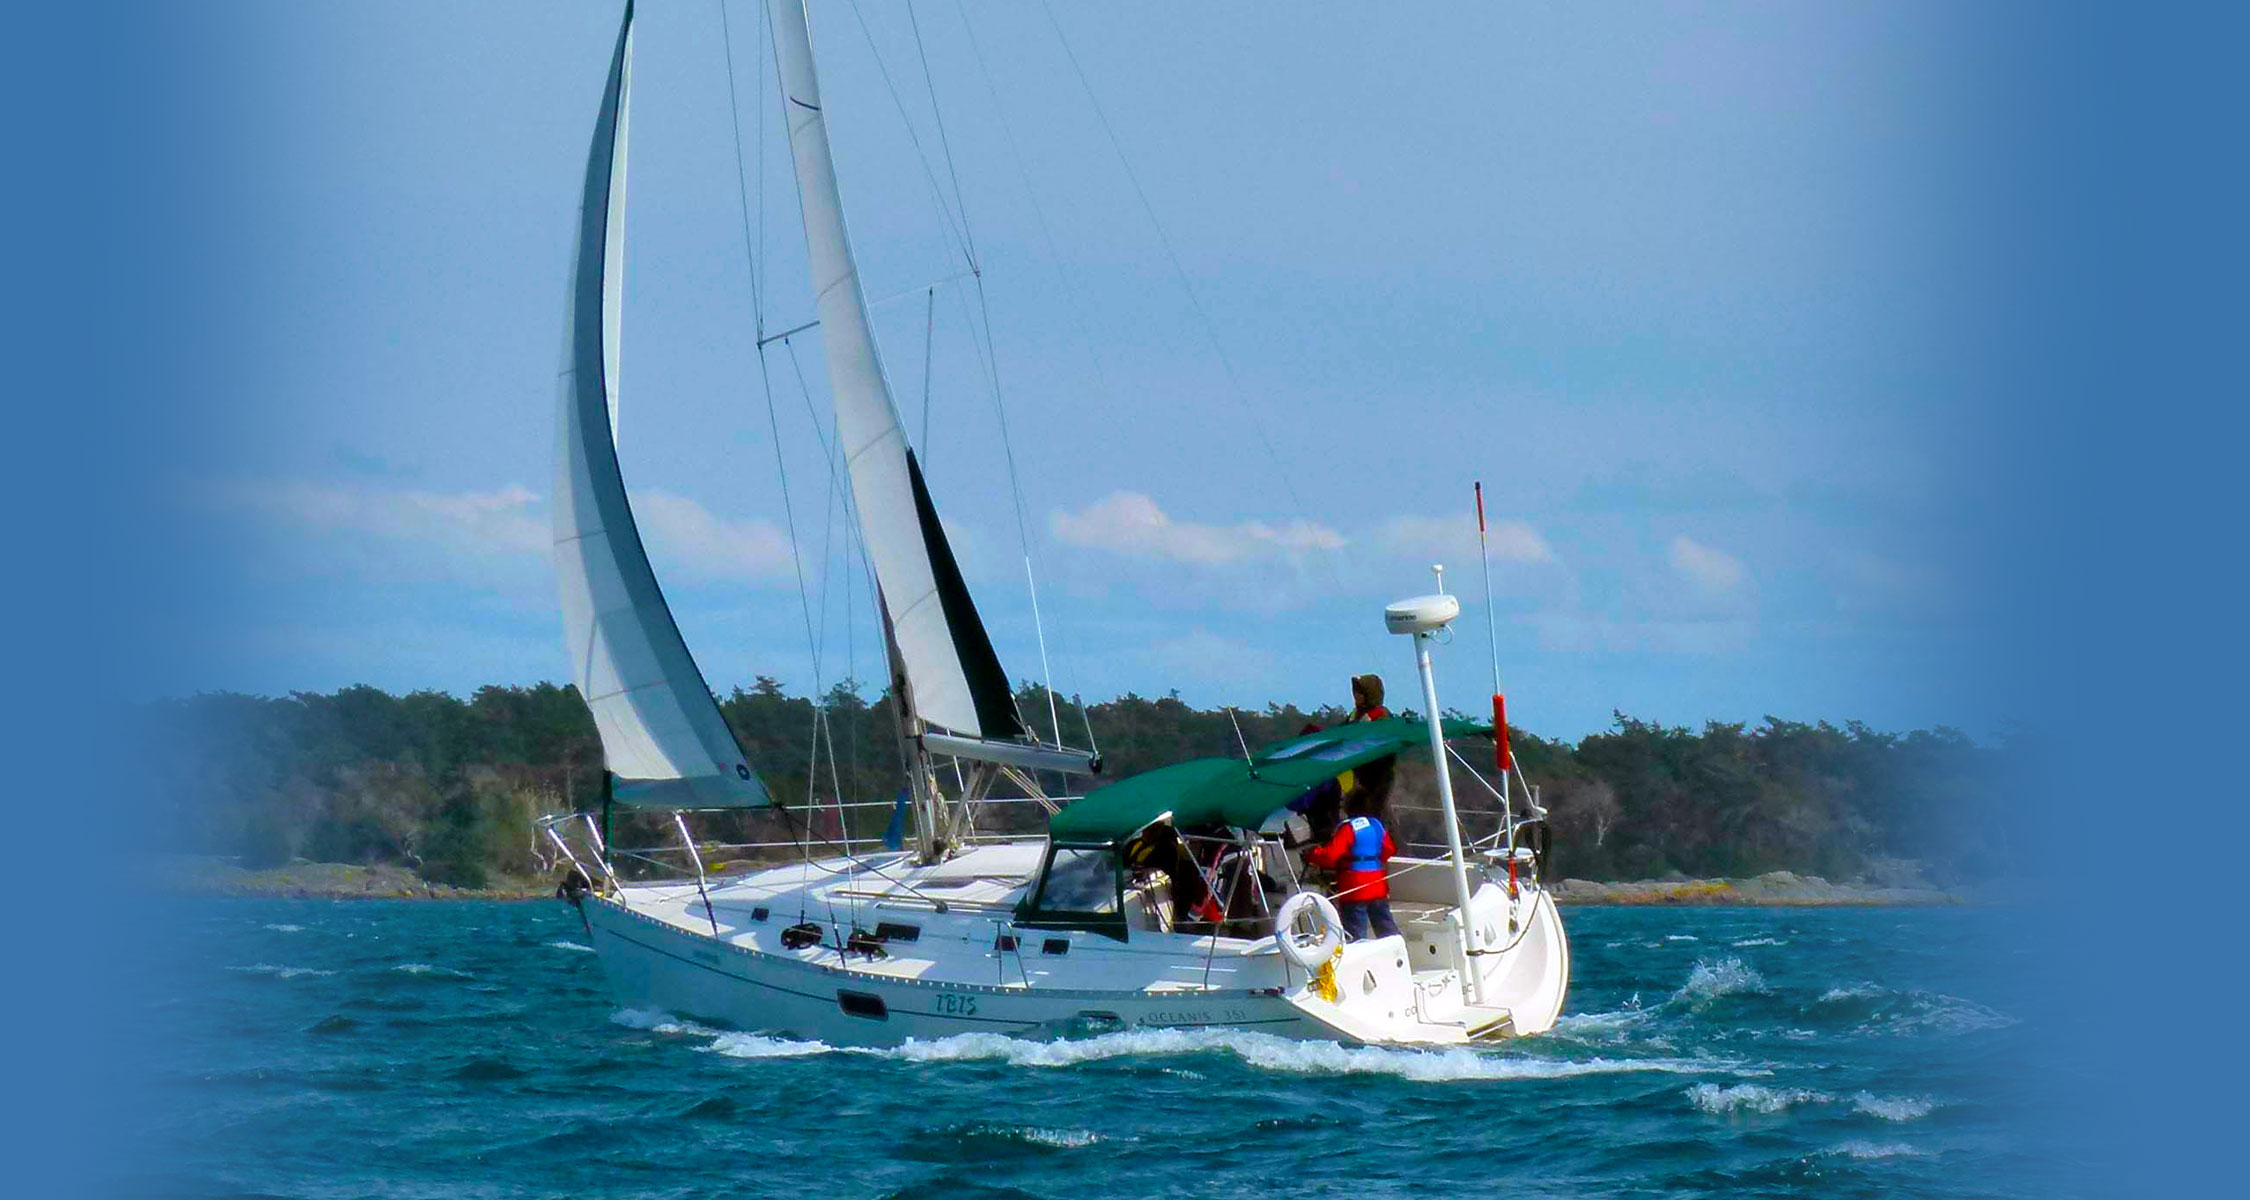 Blackfish Sailing Adventures – Sail Victoria and the Gulf